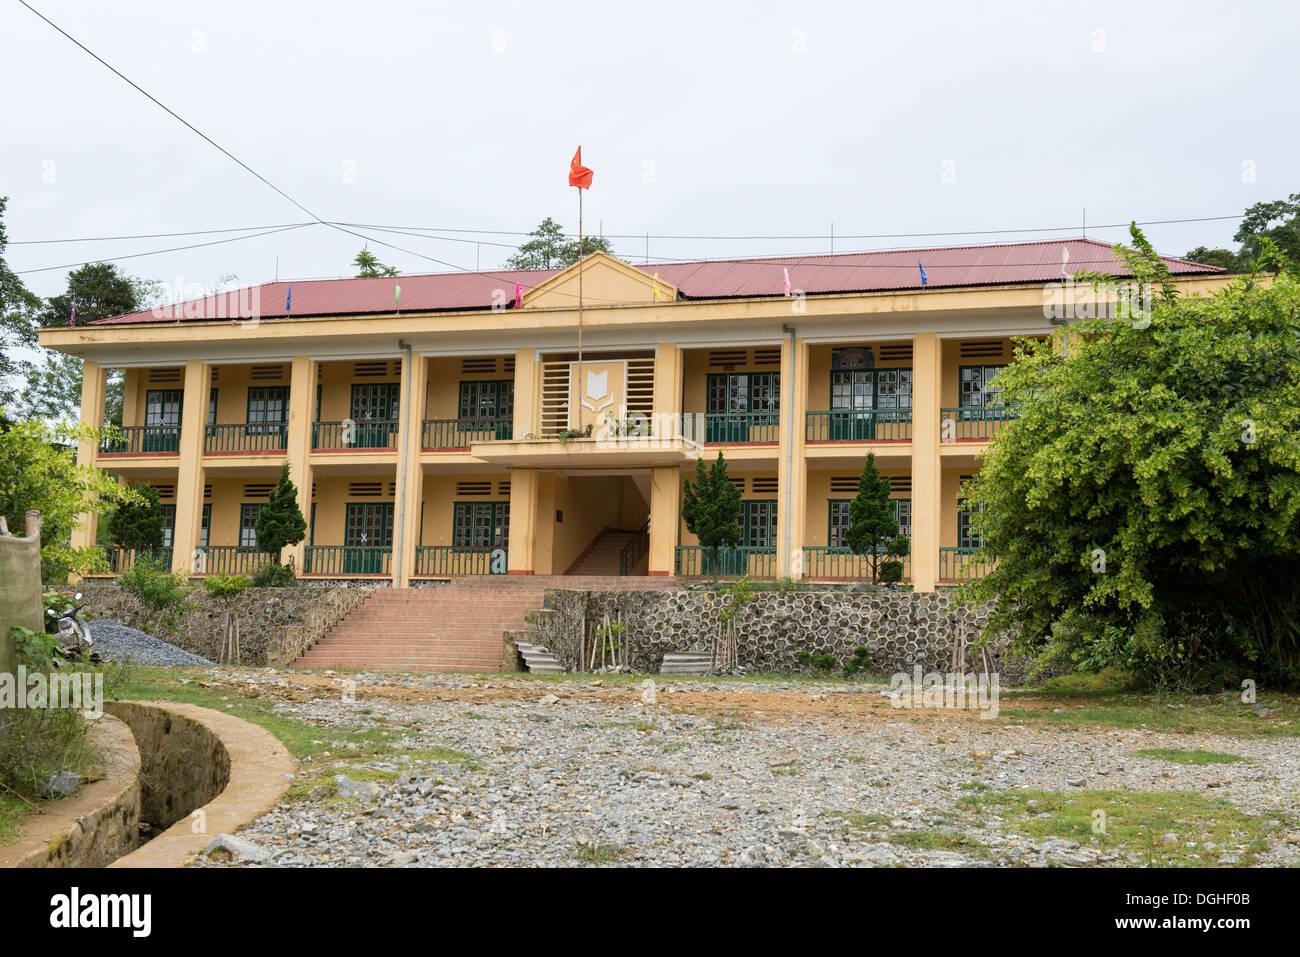 Minority group flower Hmong village school, Bac Ha, Lao Cai, Vietnam - Stock Image